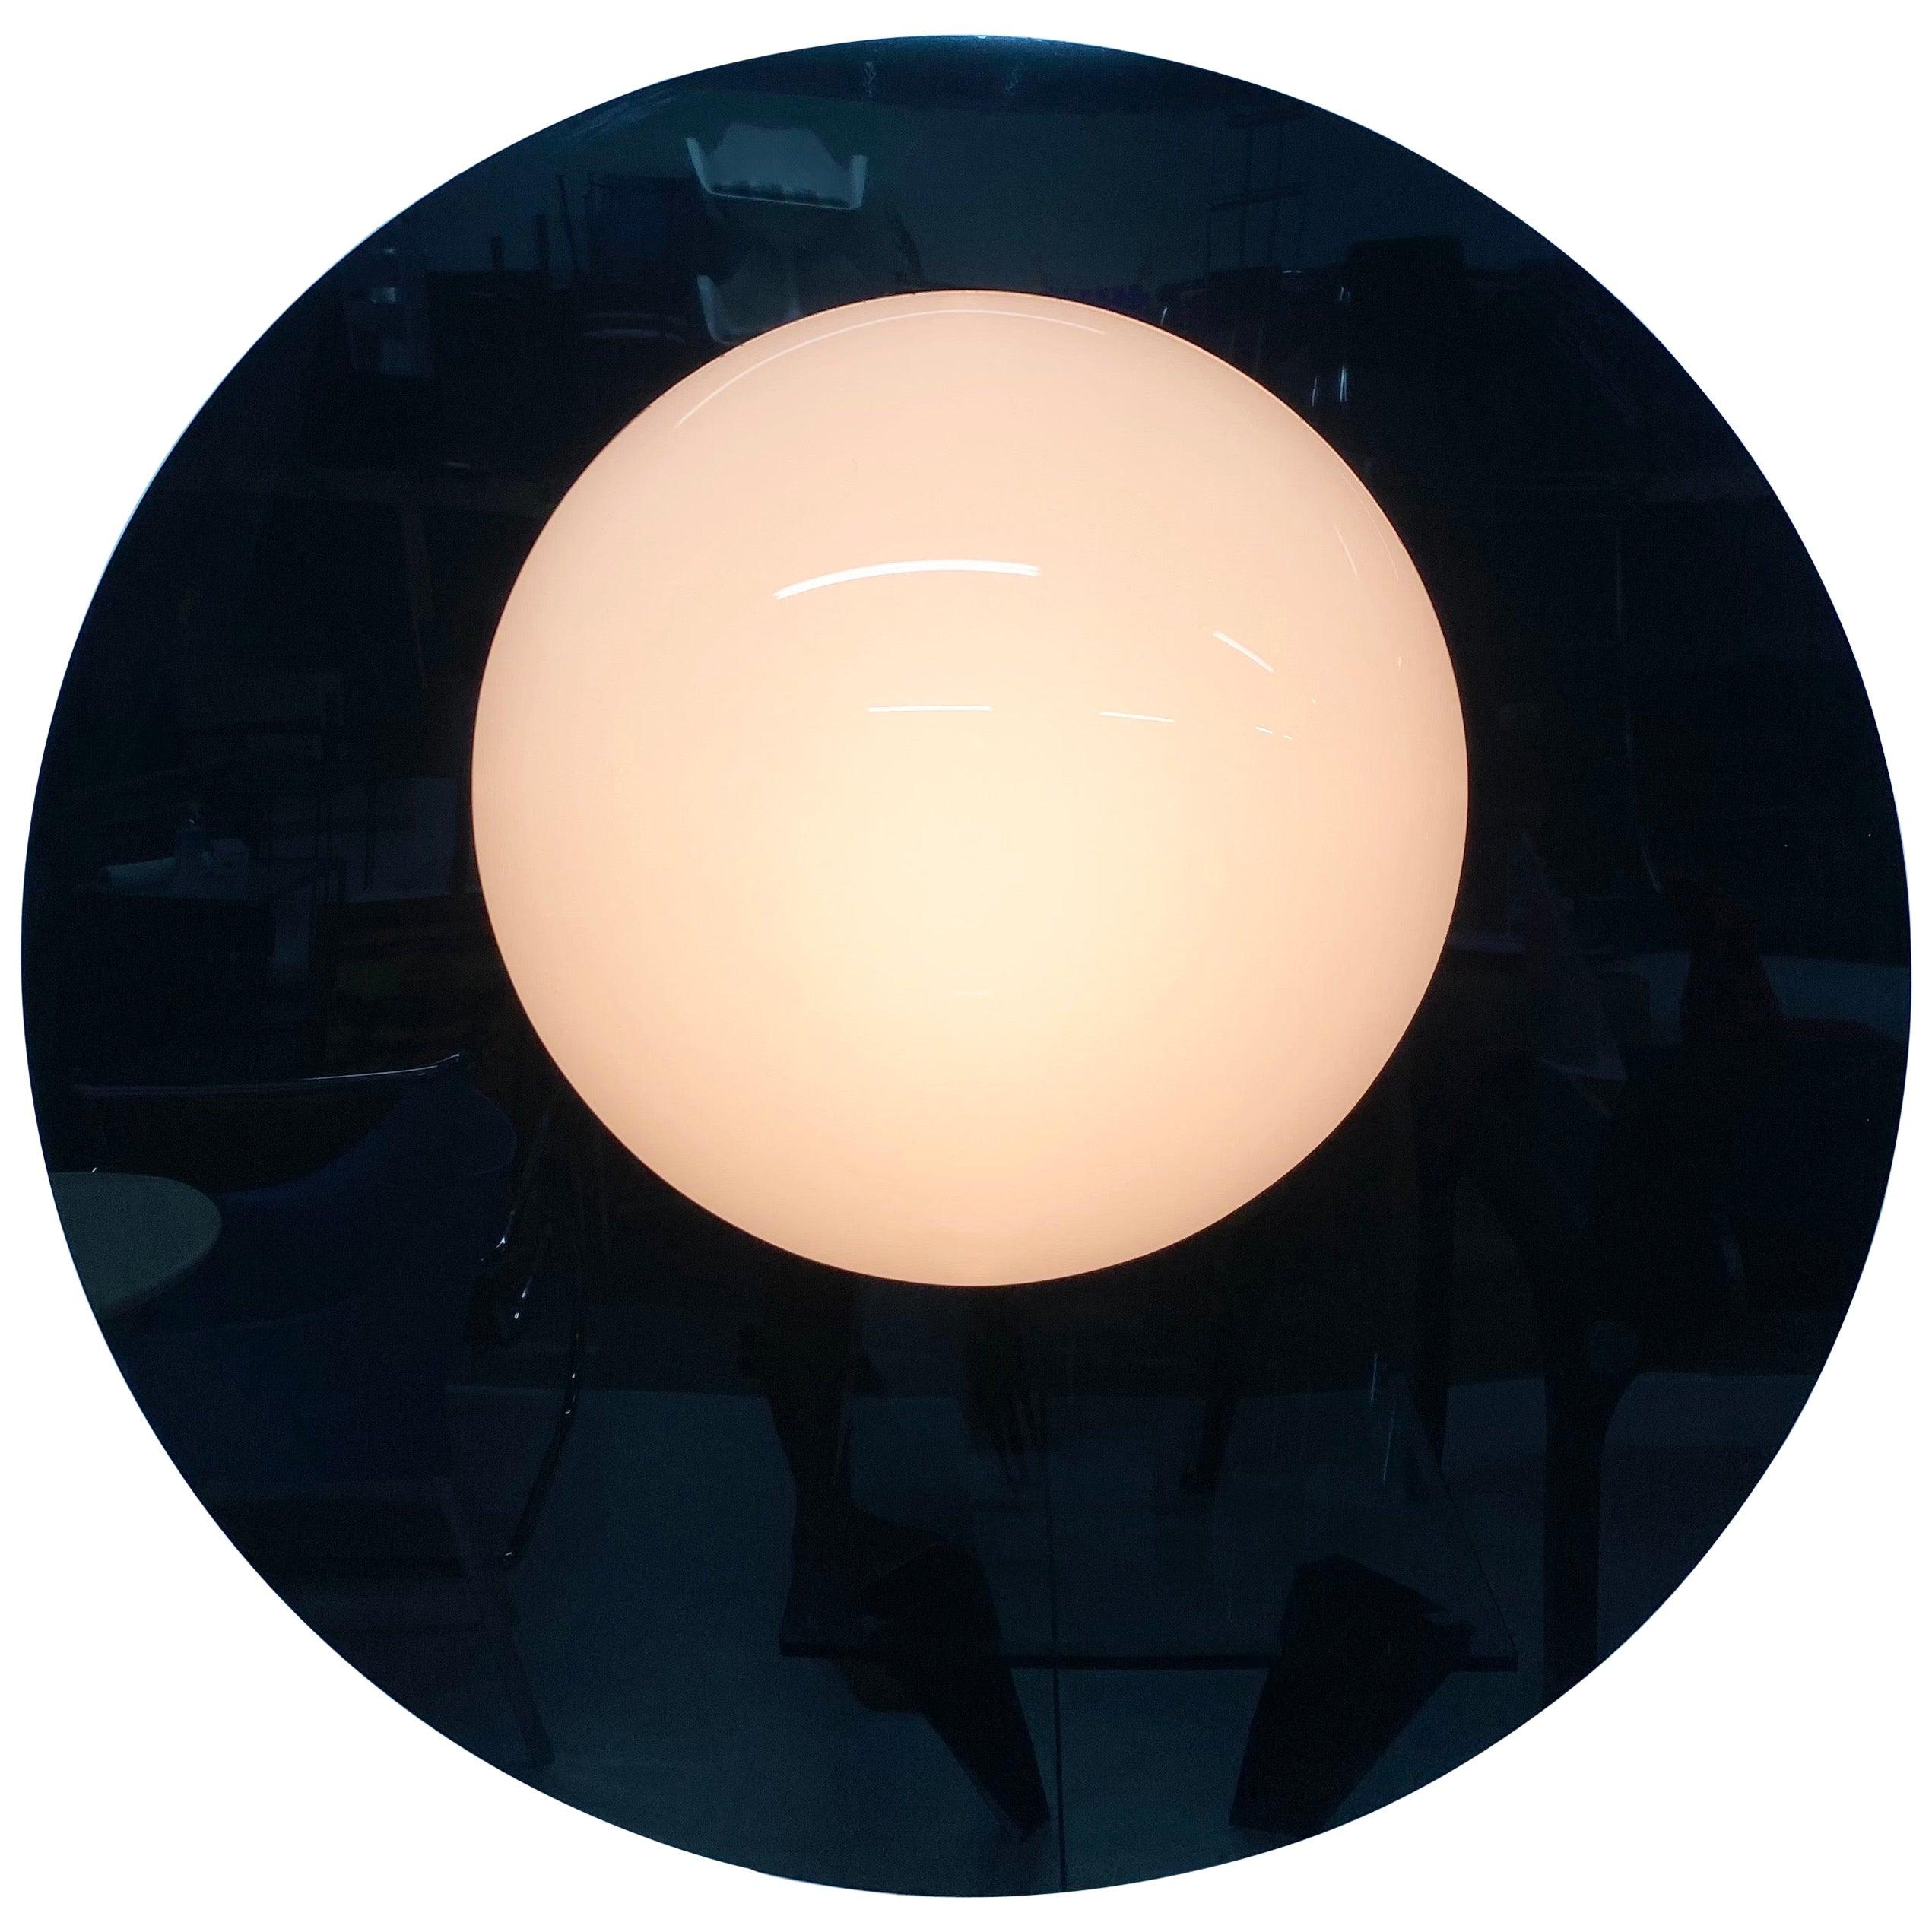 Postmodern Plexiglass Lunar Eclipse Orb Wall Mounted Lamp, 1980s